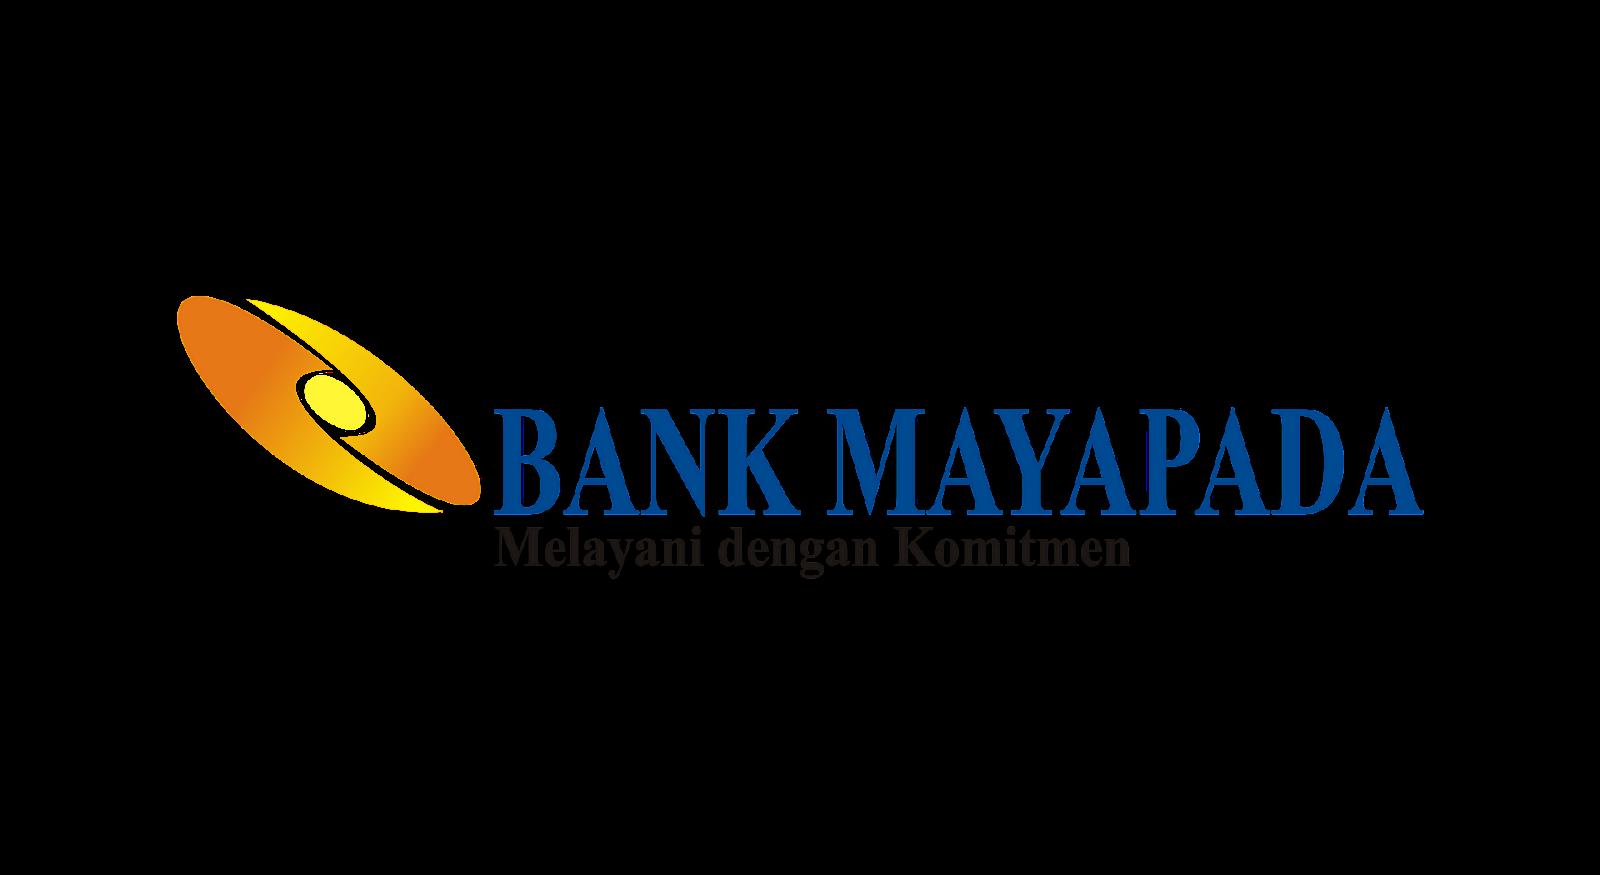 Logo Bank Mayapada Format PNG